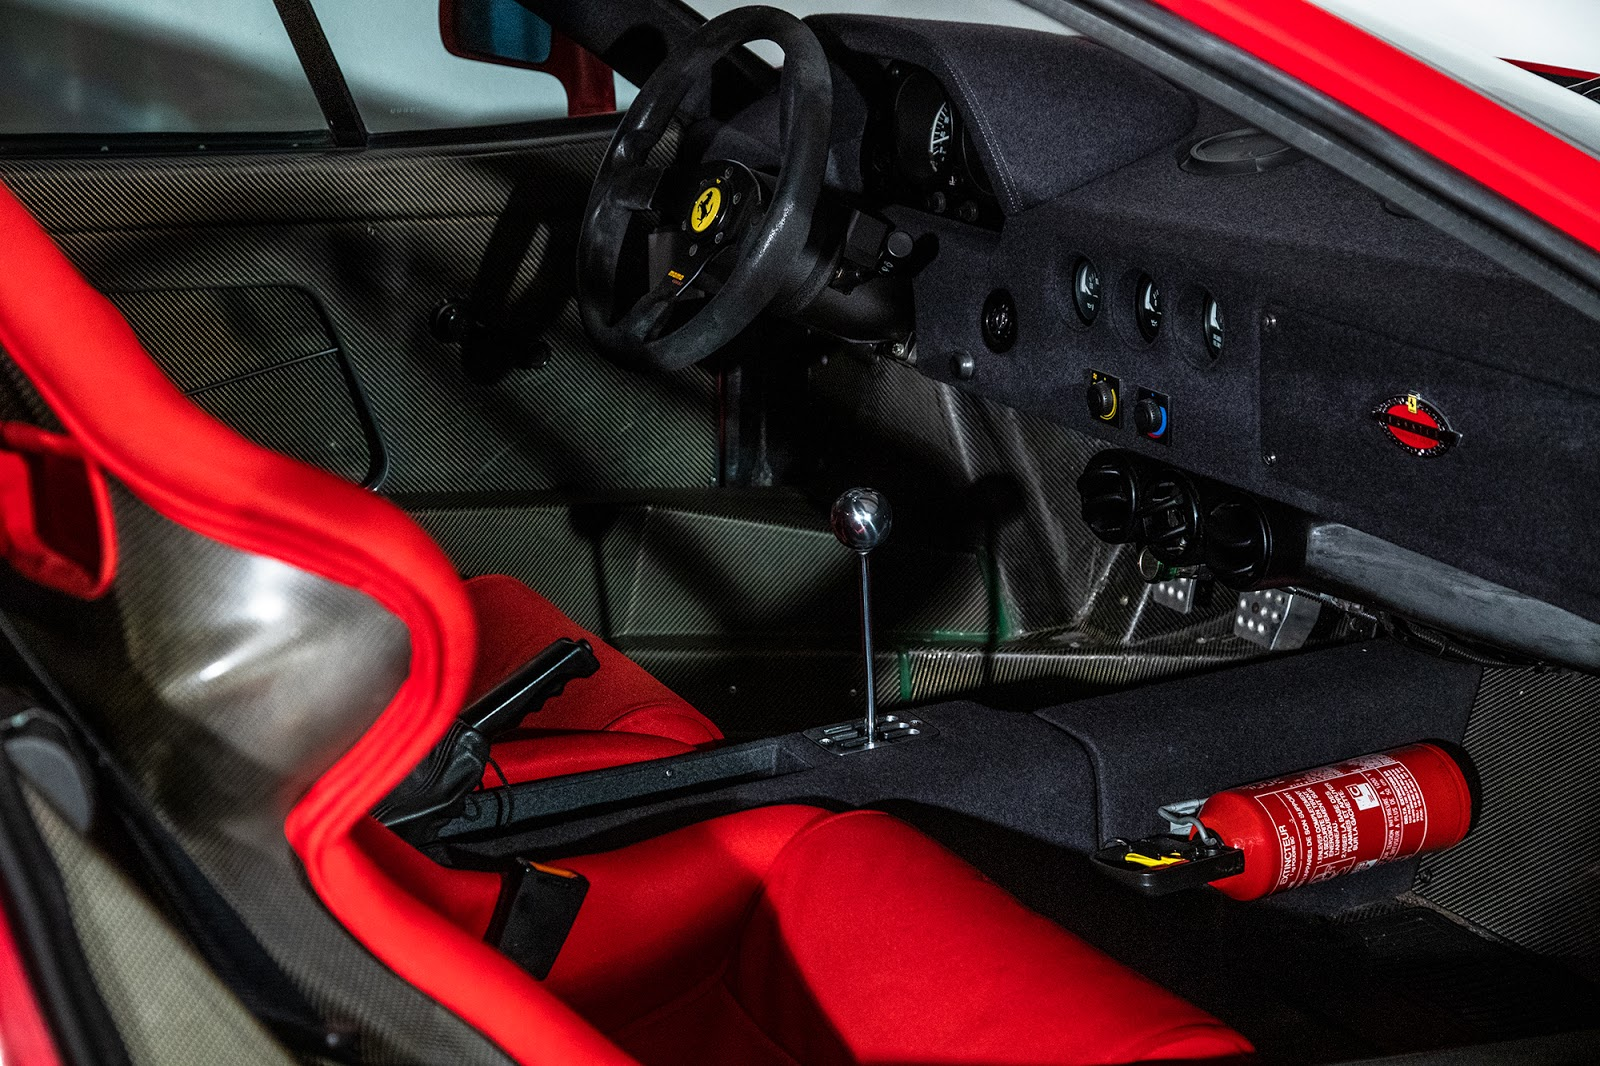 MK5 5090 F40. O μύθος, ο θρύλος F40, Ferrari, Ferrari F40, retrocar, retrocar sunday, zblog